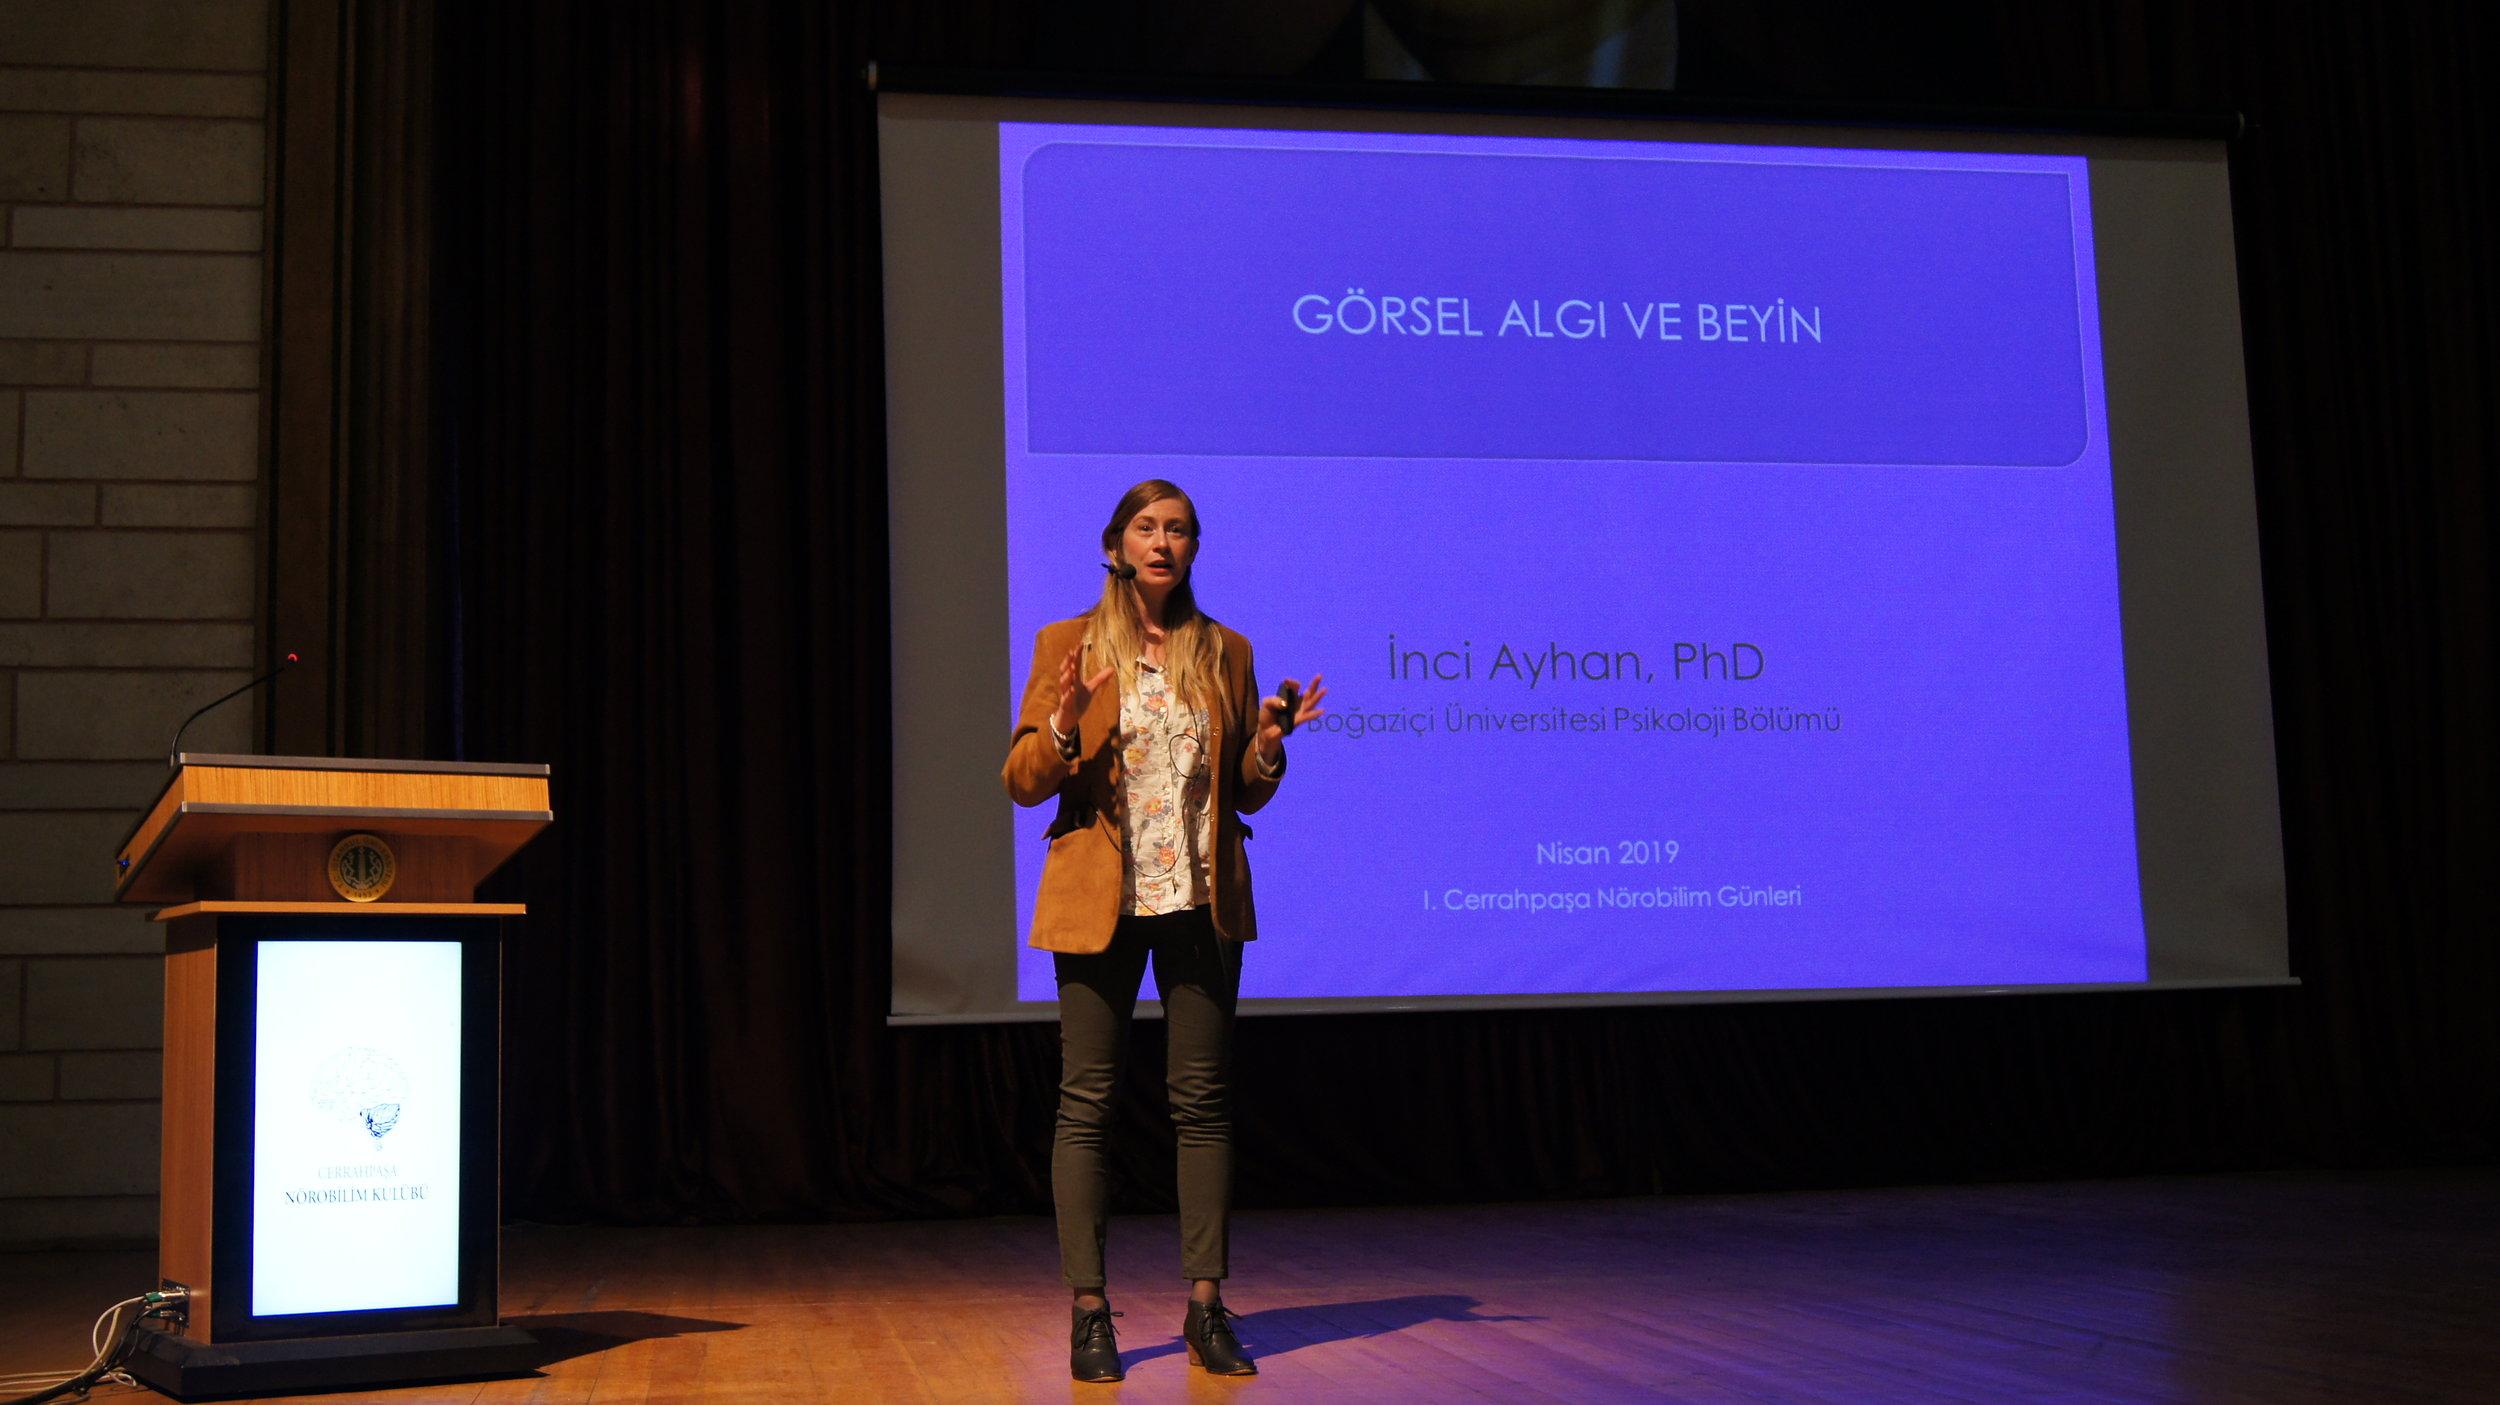 Dr. İnci Ayhan